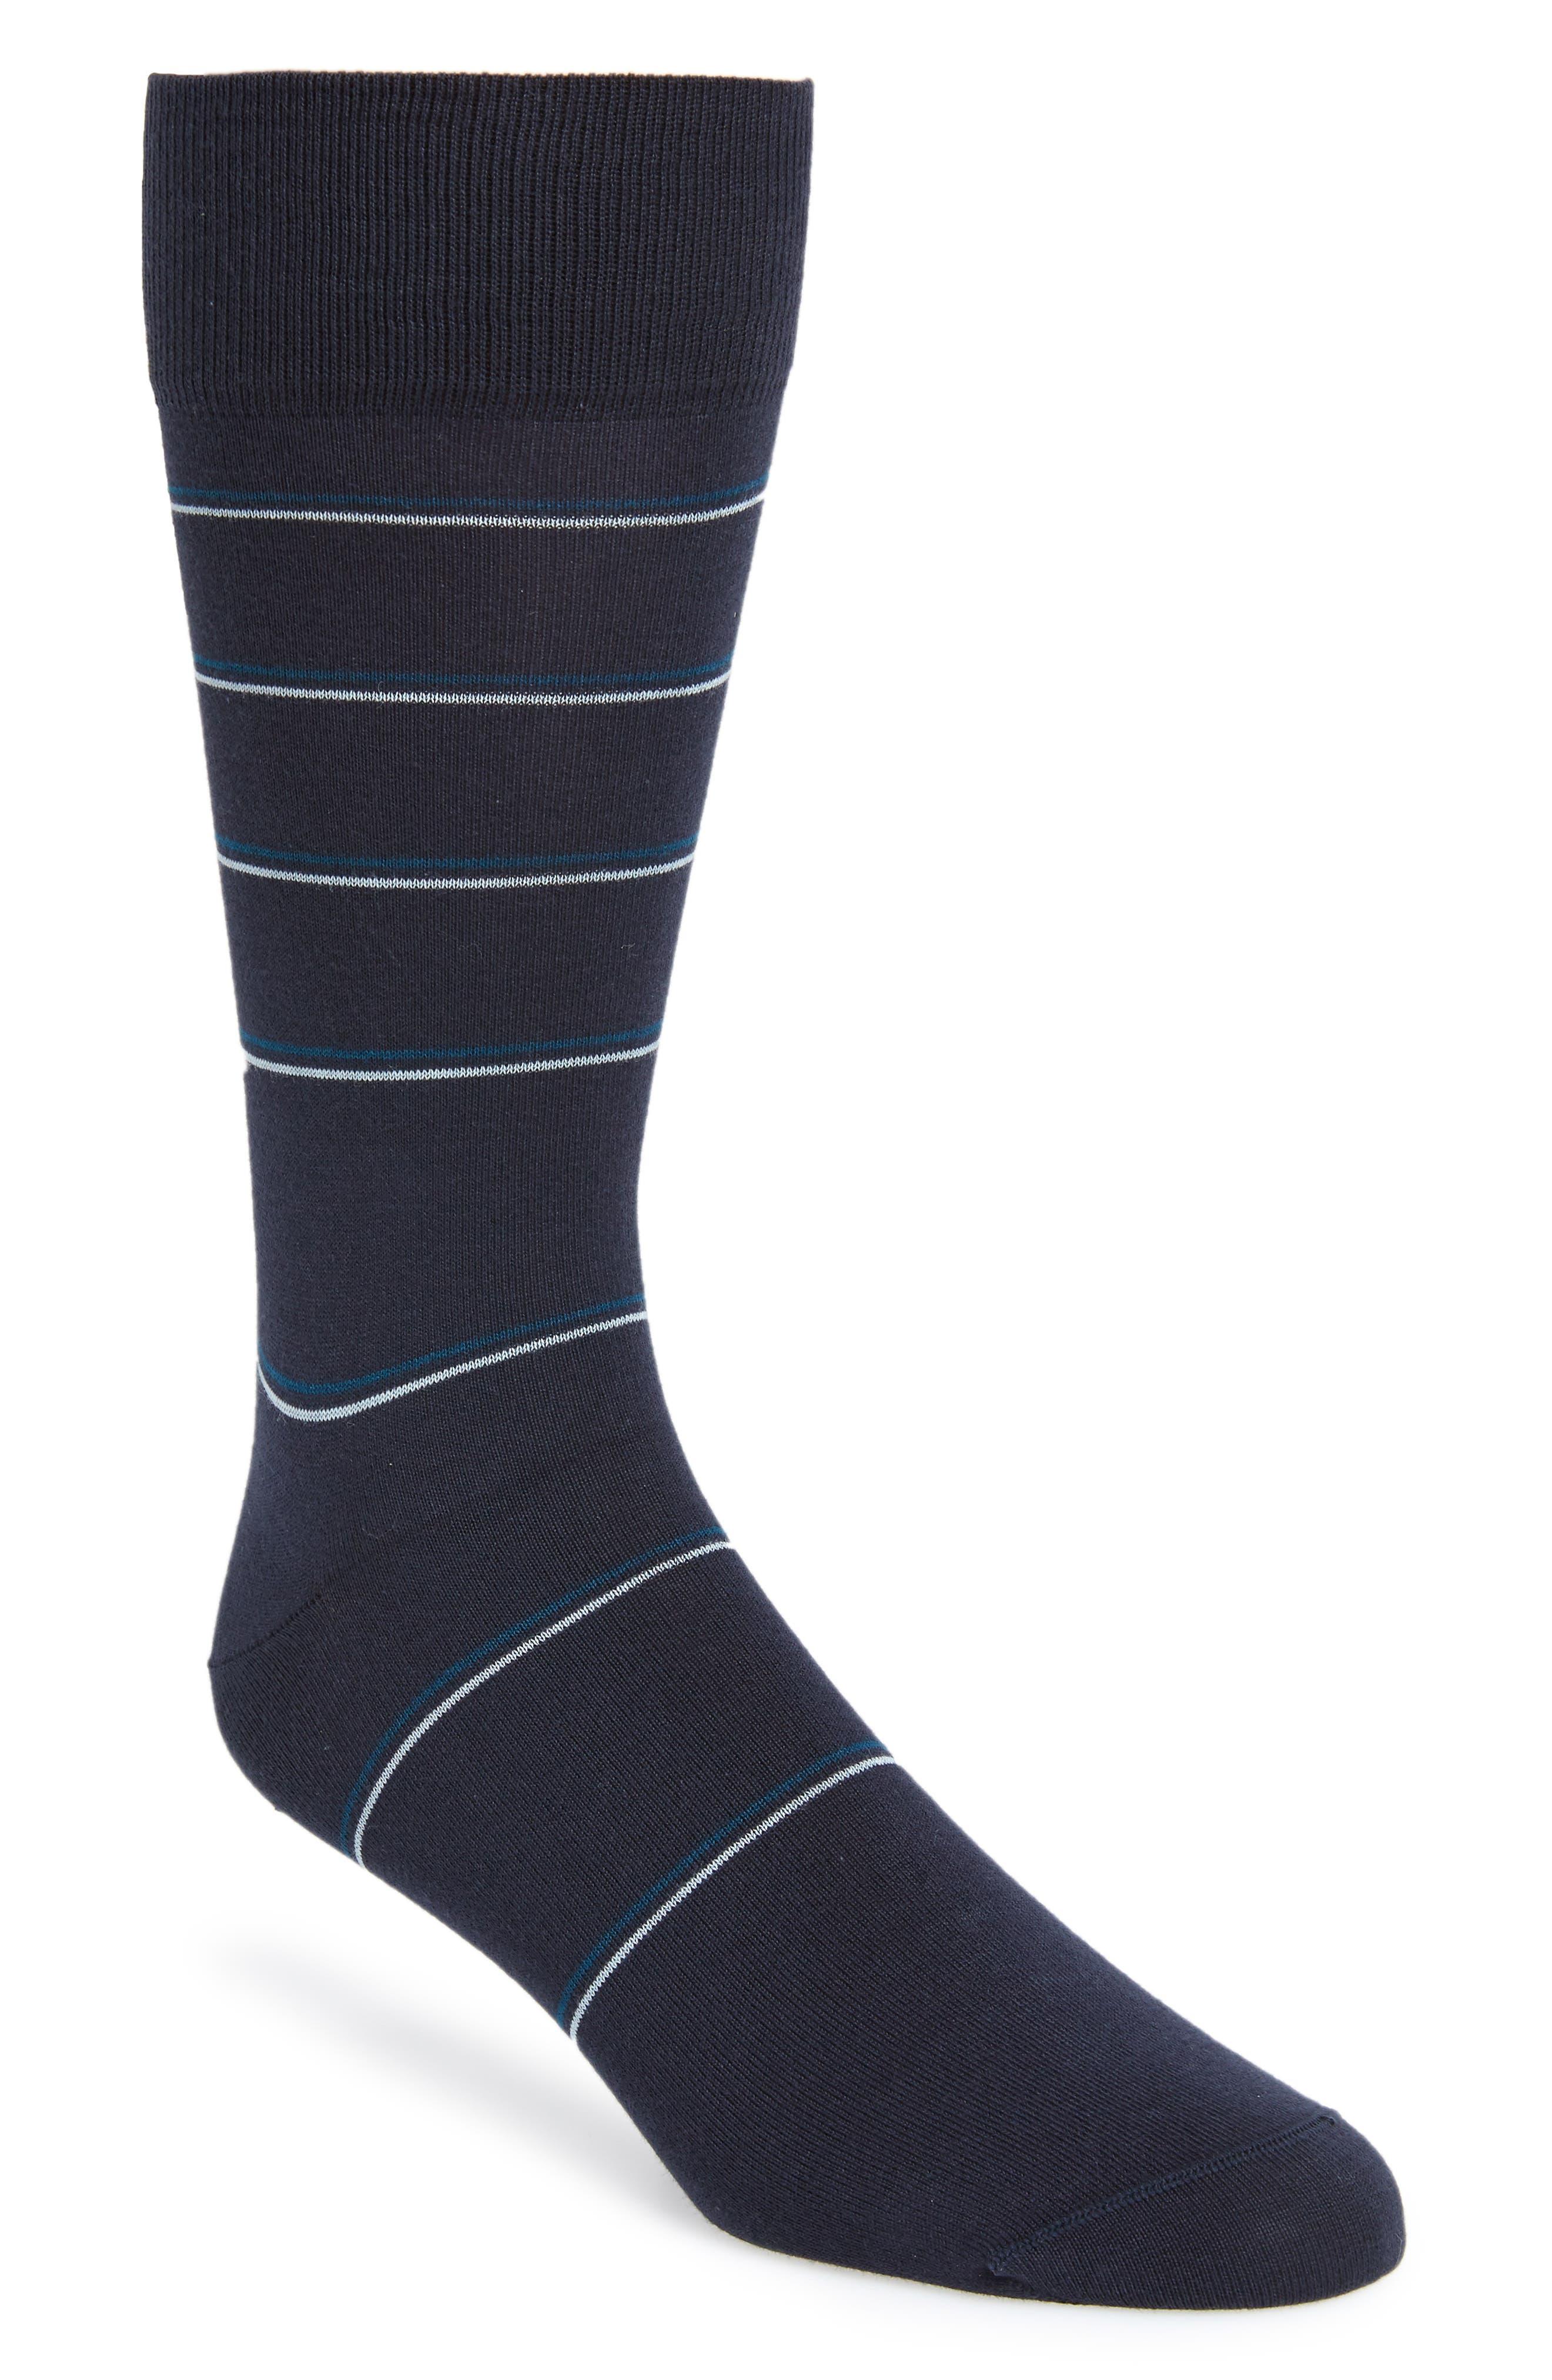 Stripe Socks,                             Main thumbnail 1, color,                             NAVY HEATHER/ WHITE